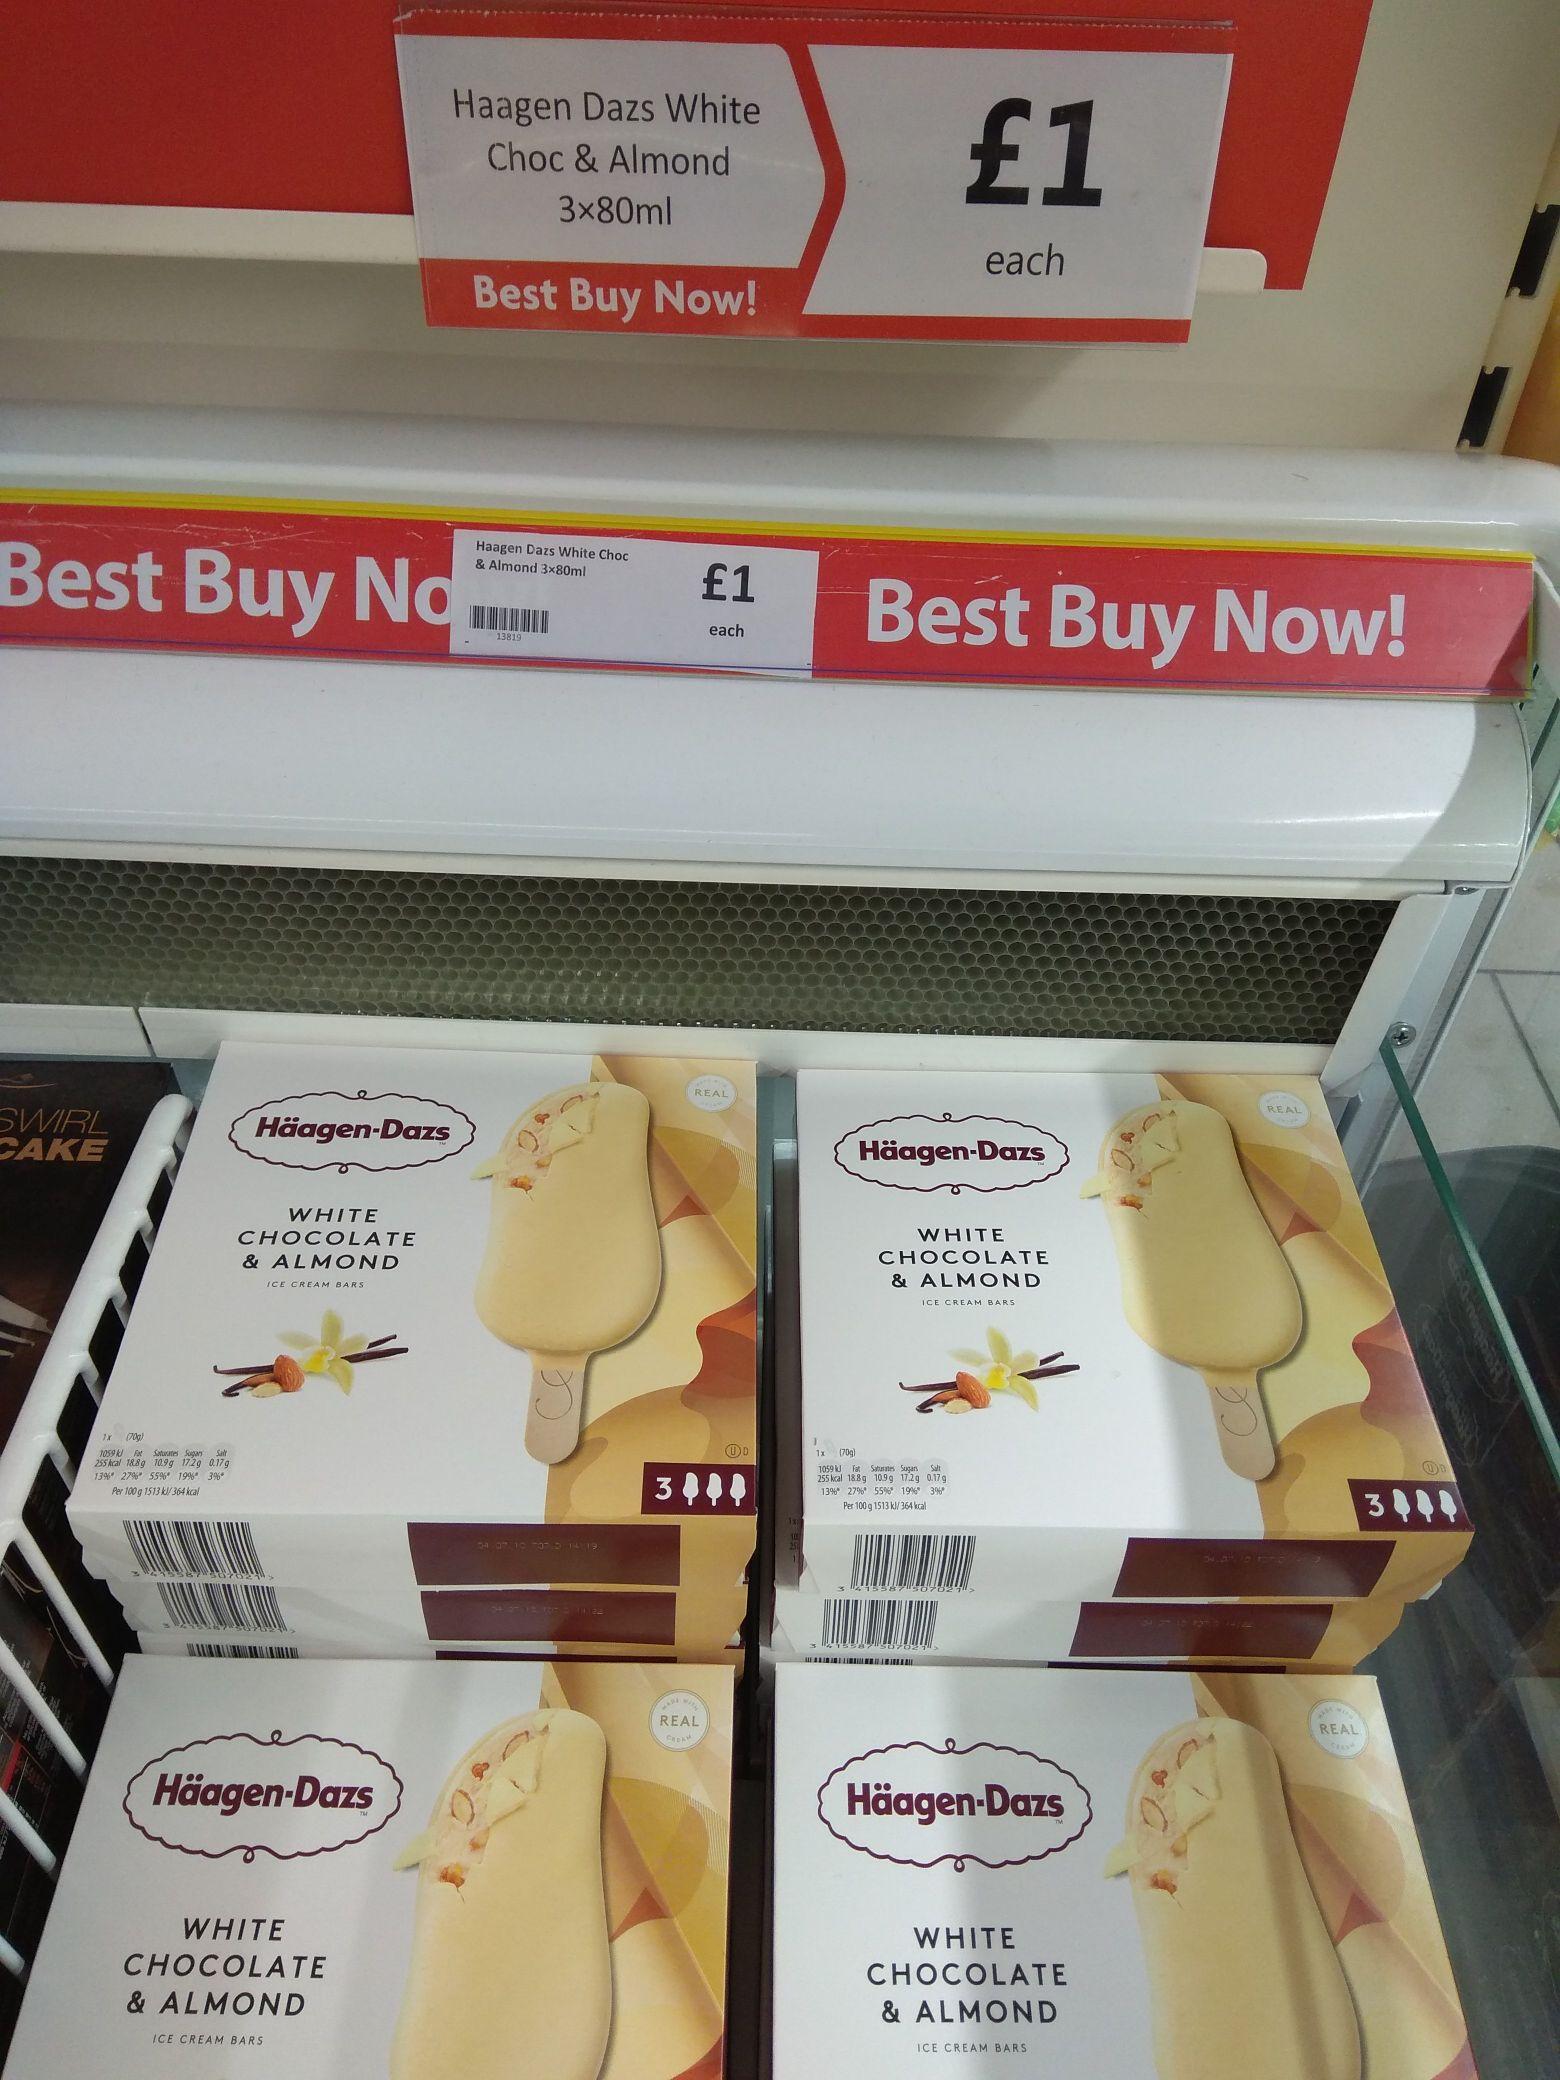 Haagen-Dazs white chocolate and almond Ice cream bars 3 x 80ml - £1 @ Heron foods